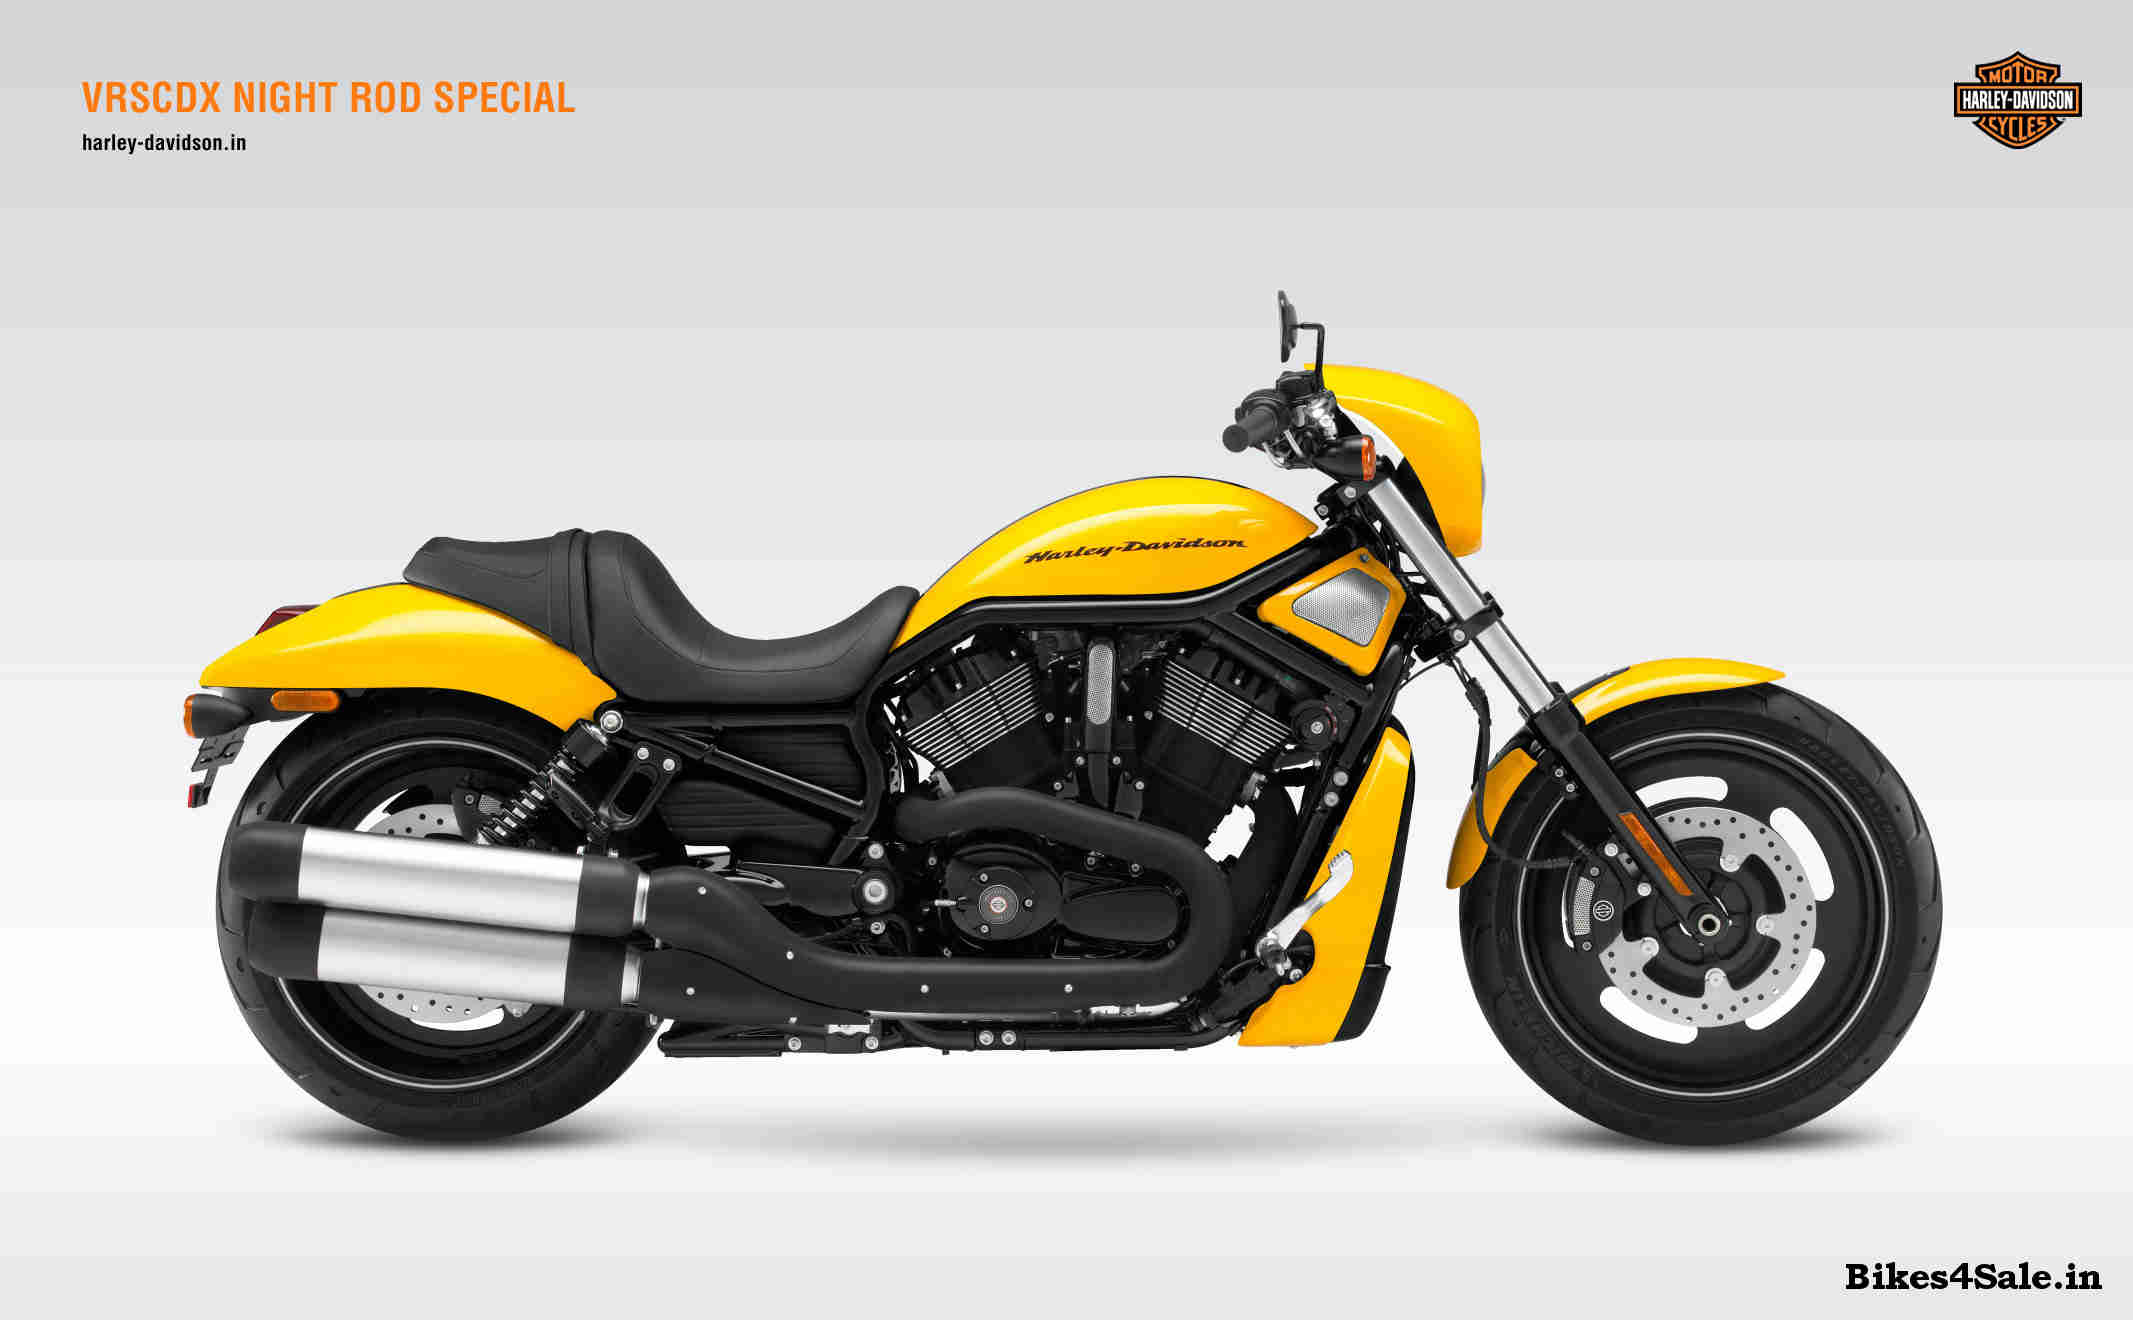 Harley Davidson VRSCDX Night Rod Special Photo